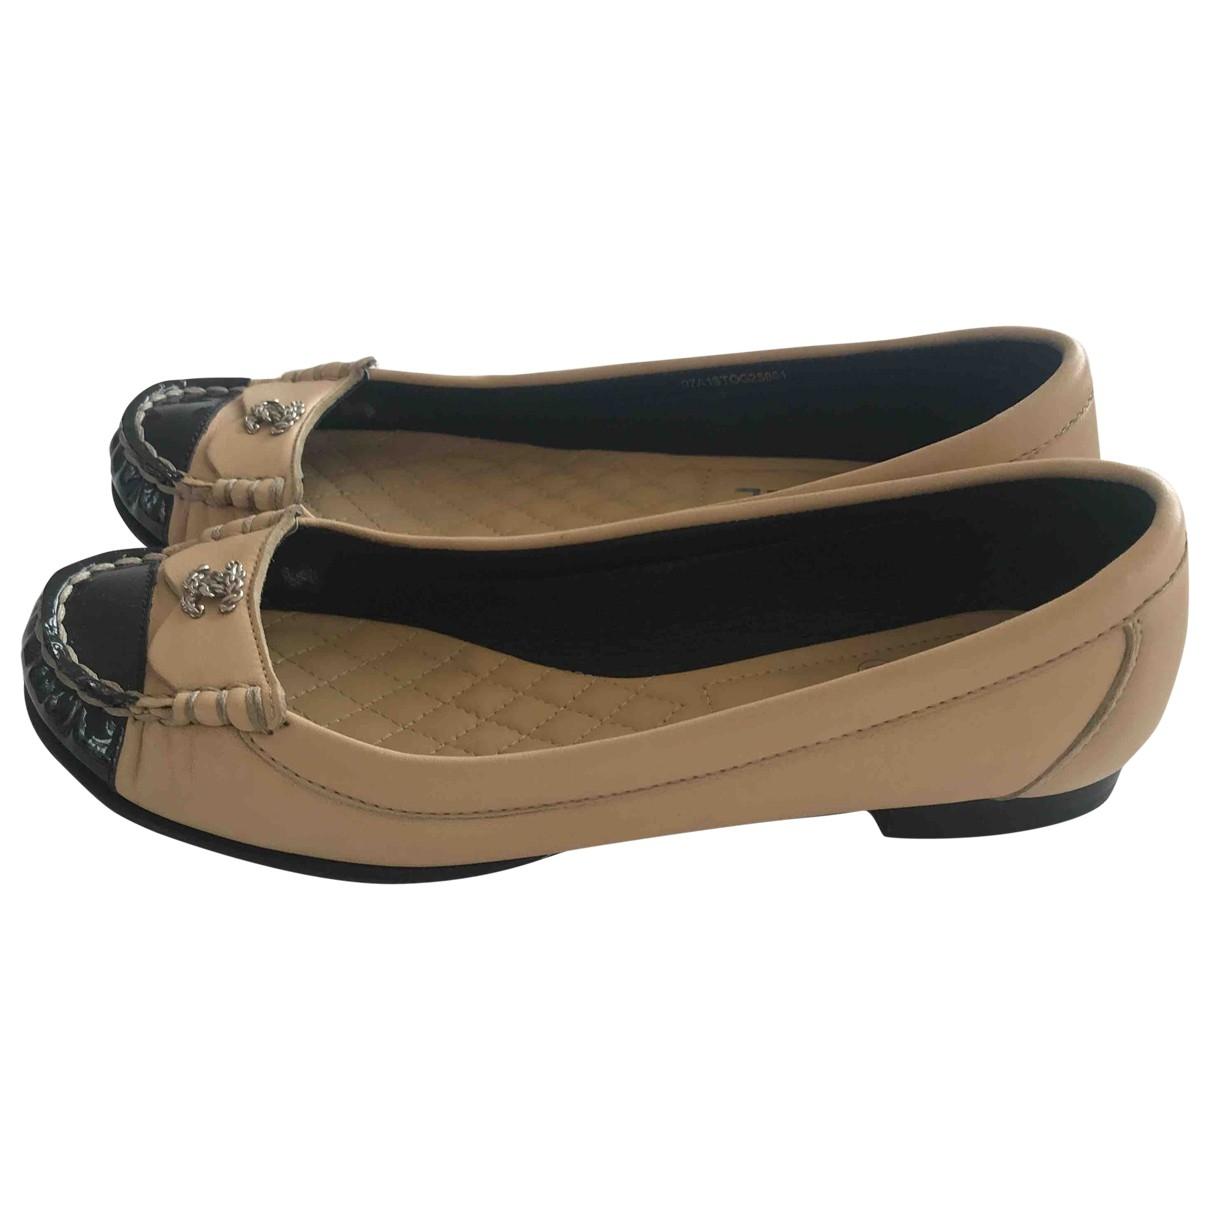 Chanel \N Beige Leather Flats for Women 37 EU